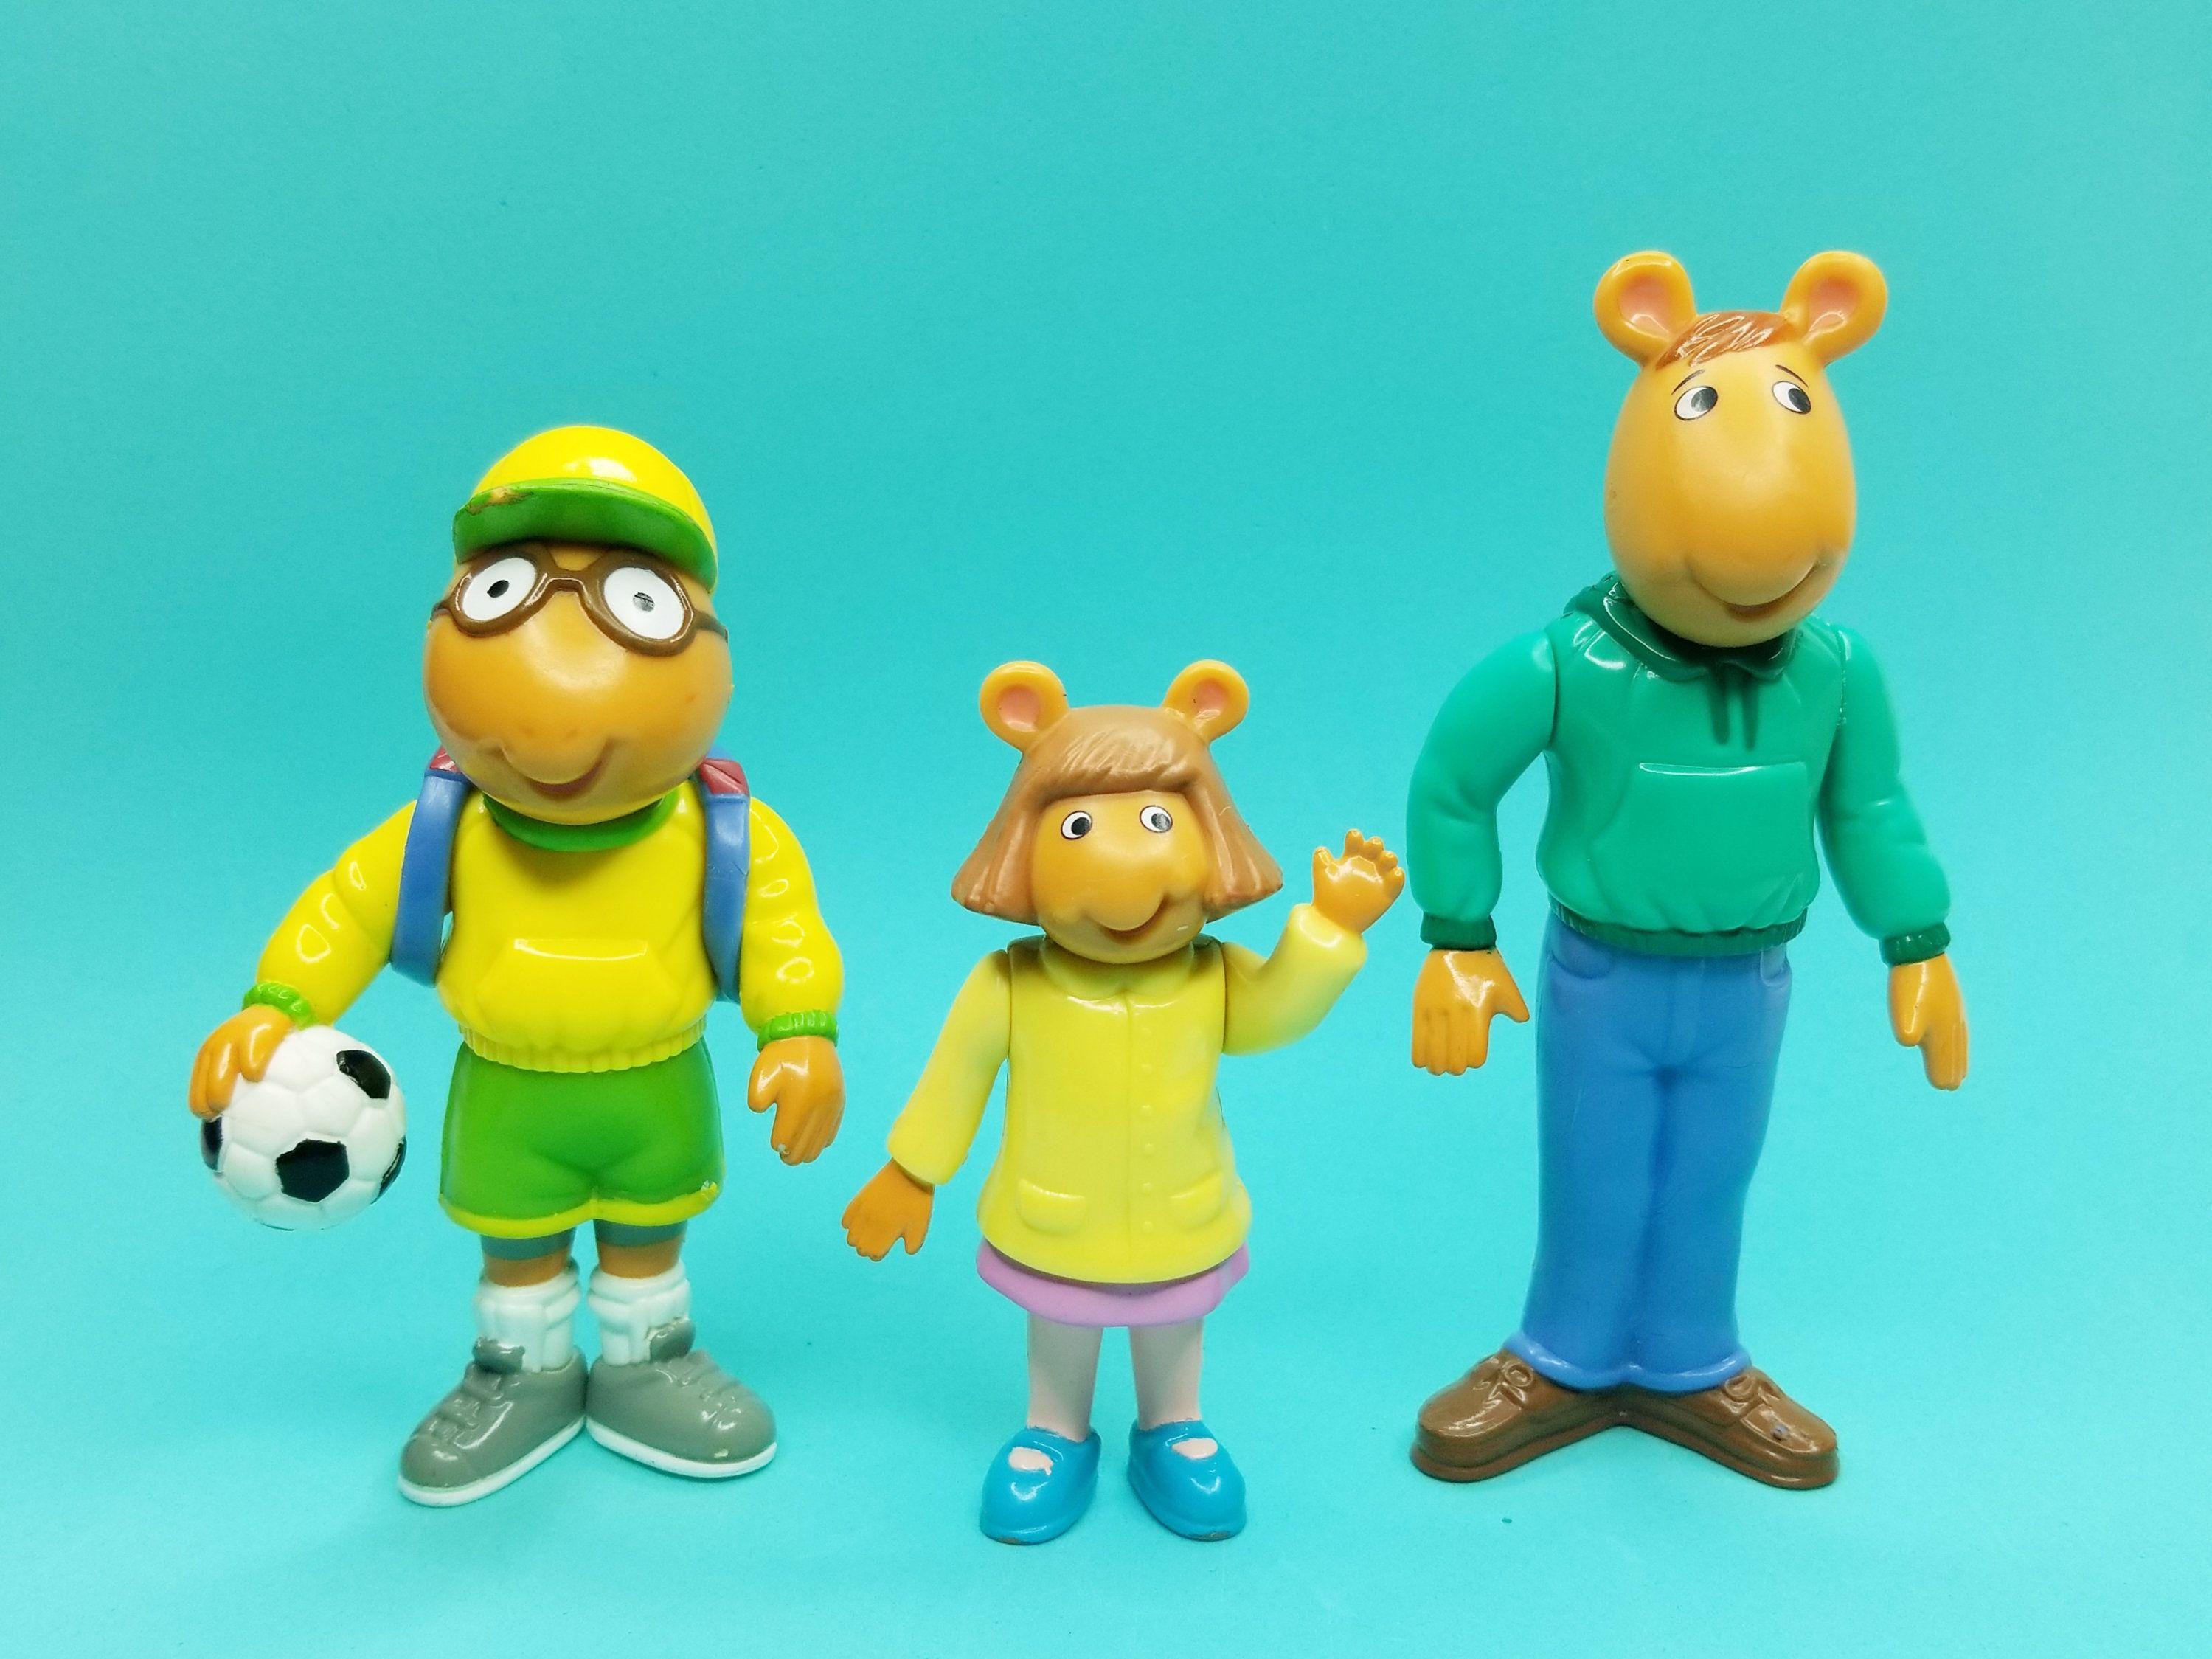 Pbs Kids Arthur Aardvark Dw And Dad Action Figures 1996 Hasbro Etsy In 2020 Cartoon Tv Cartoon Tv Shows Pbs Kids